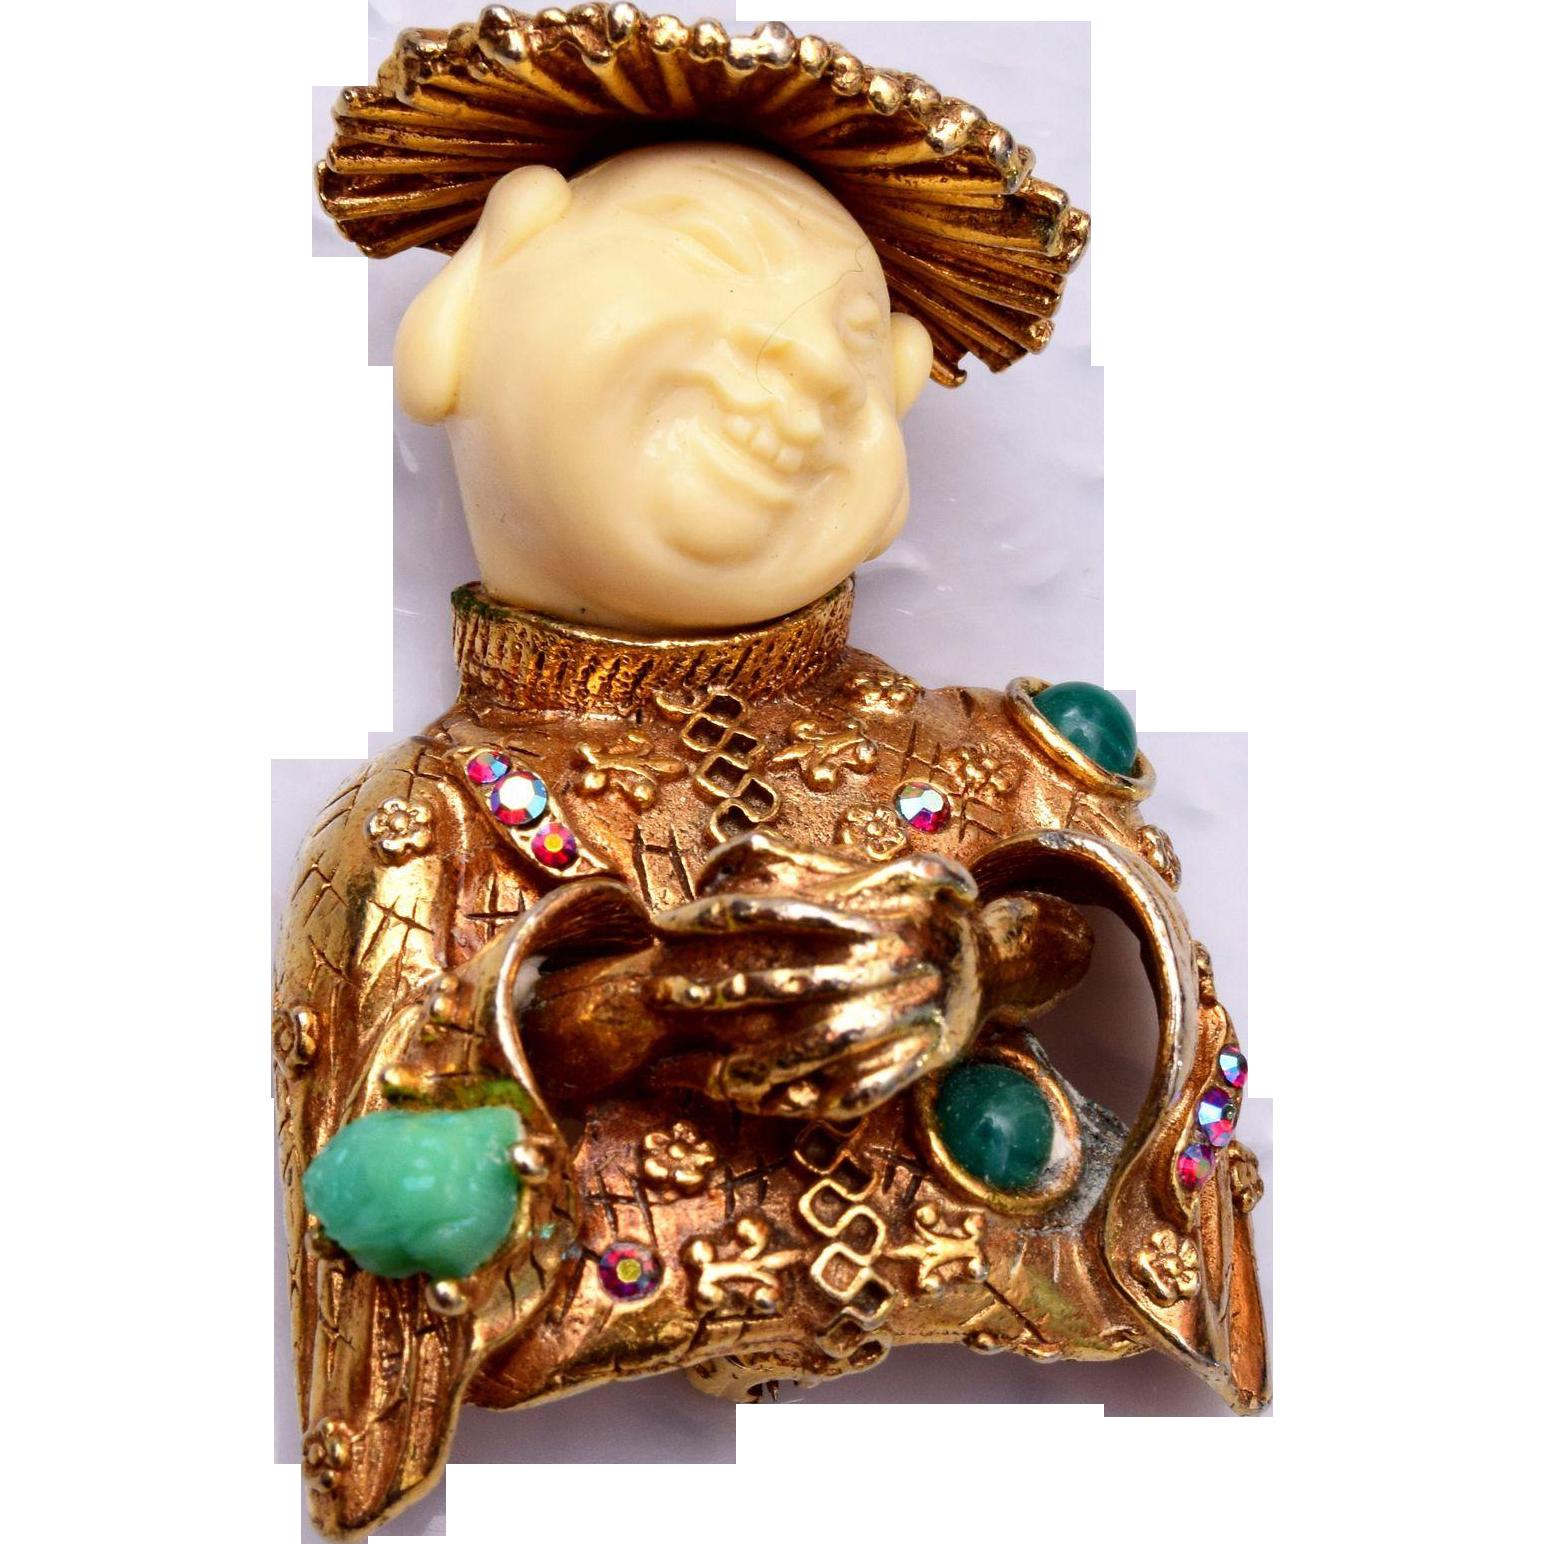 HAR 1960 China Man - Smiling Buddha Brooch